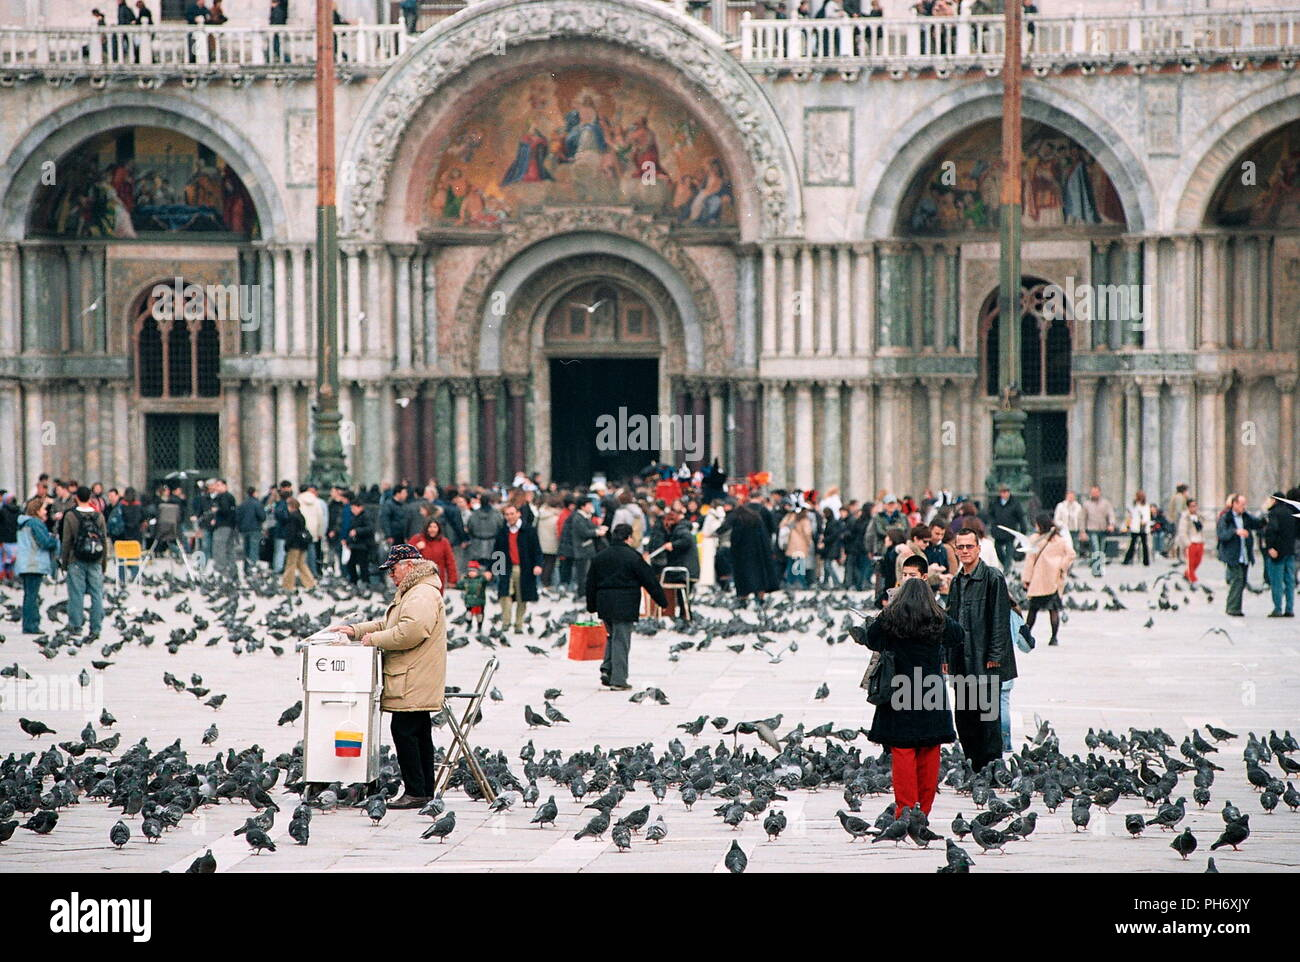 AJAXNETPHOTO. VENICE, ITALY - PIDGEONS ON PIAZZA SAN MARCO. PHOTO:JONATHAN EASTLAND/AJAX REF:51011_2720A4288 - Stock Image